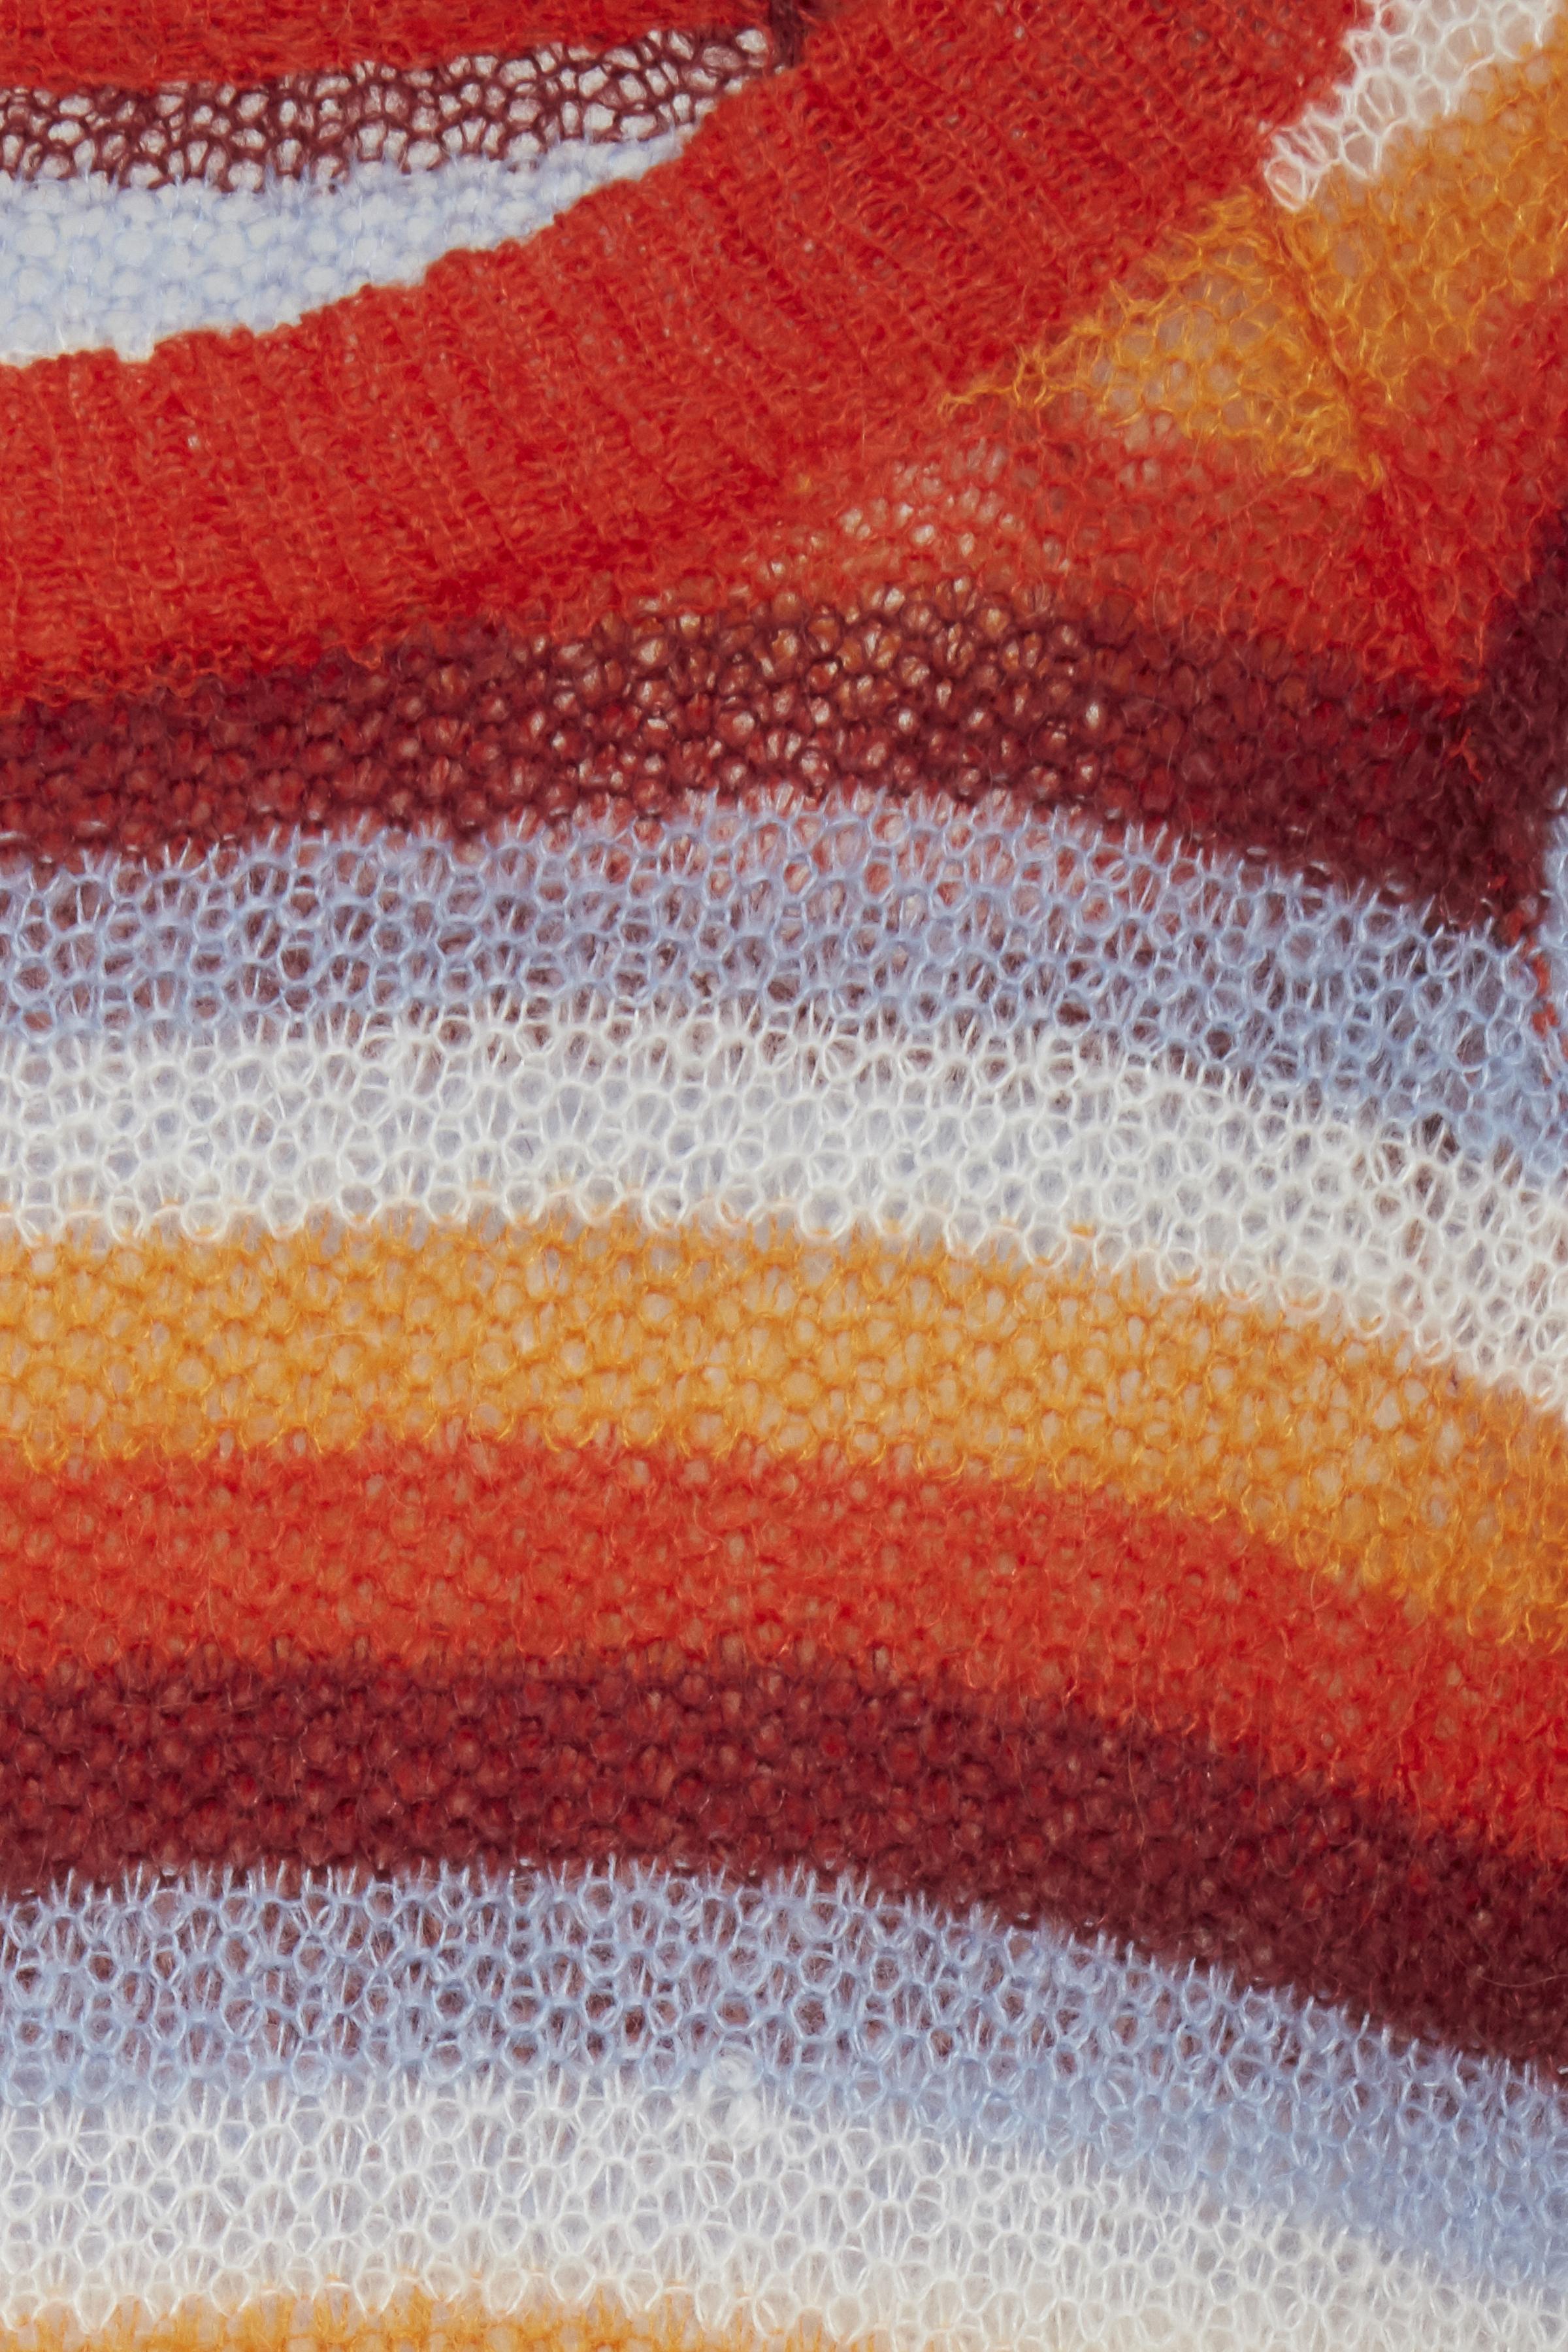 Spicy Red Combi Strikpullover fra b.young – Køb Spicy Red Combi Strikpullover fra str. XS-XXL her